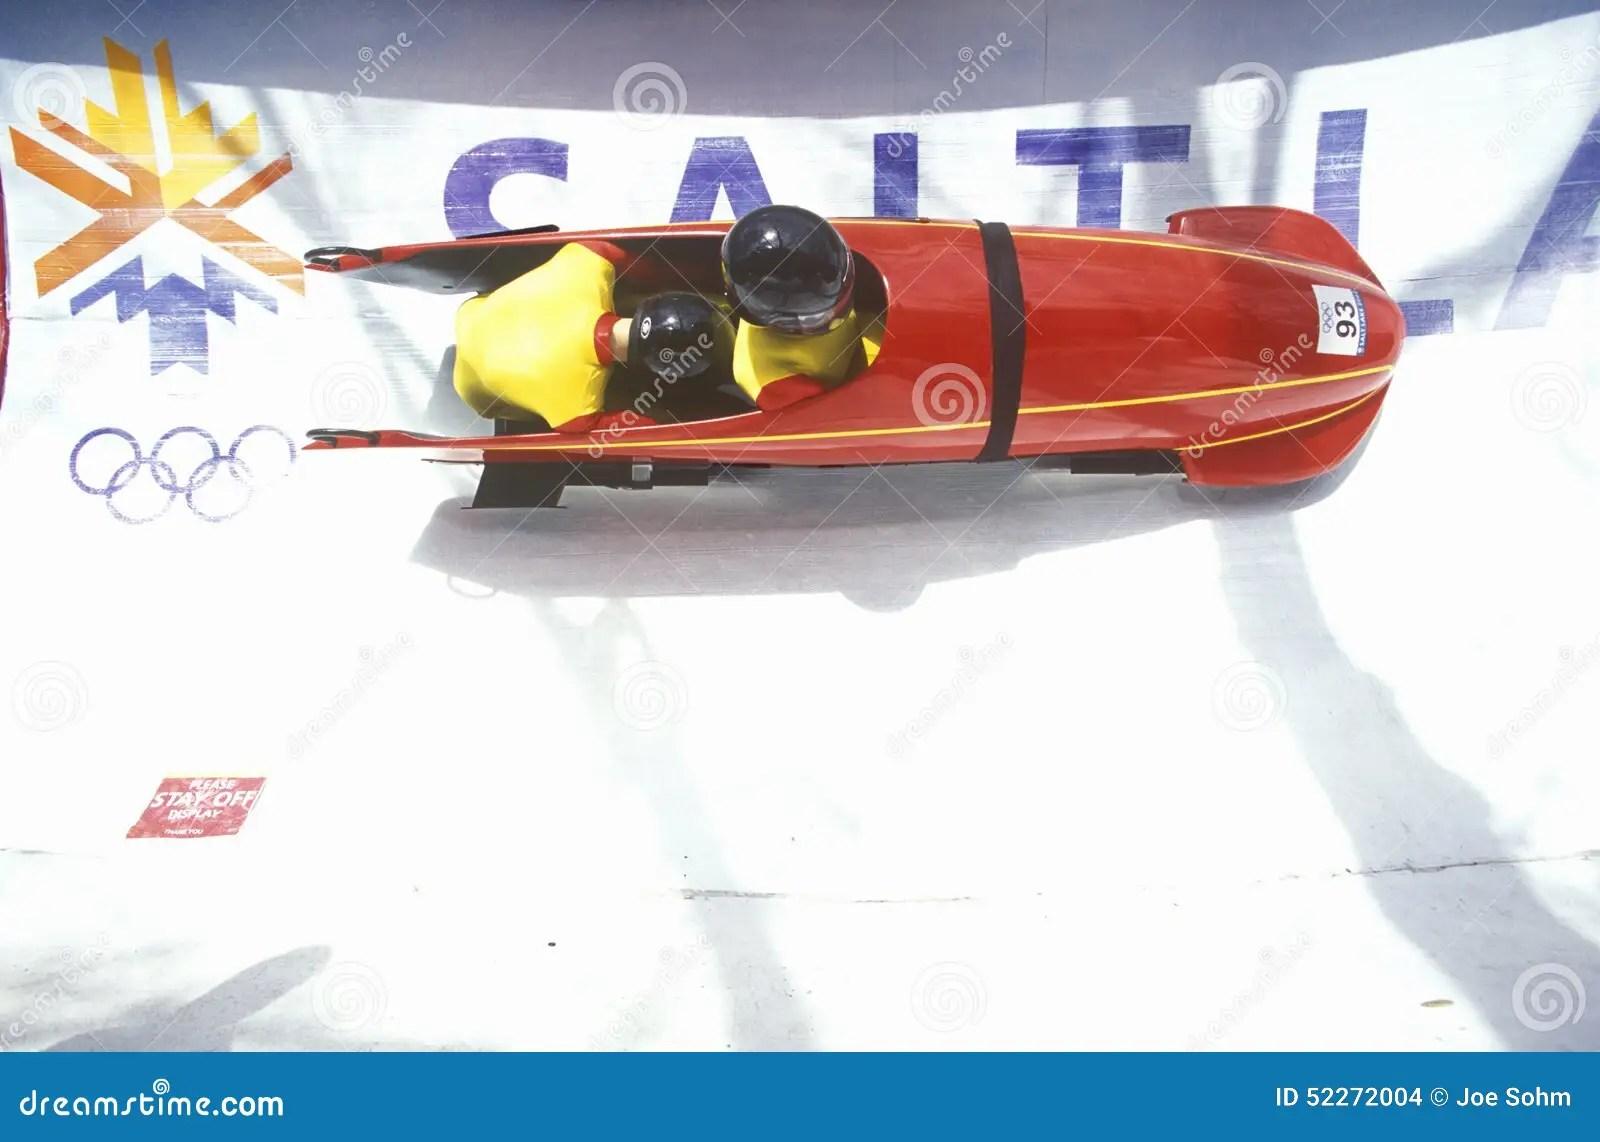 Bobsled Exhibit At Winter Olympics Salt Lake City